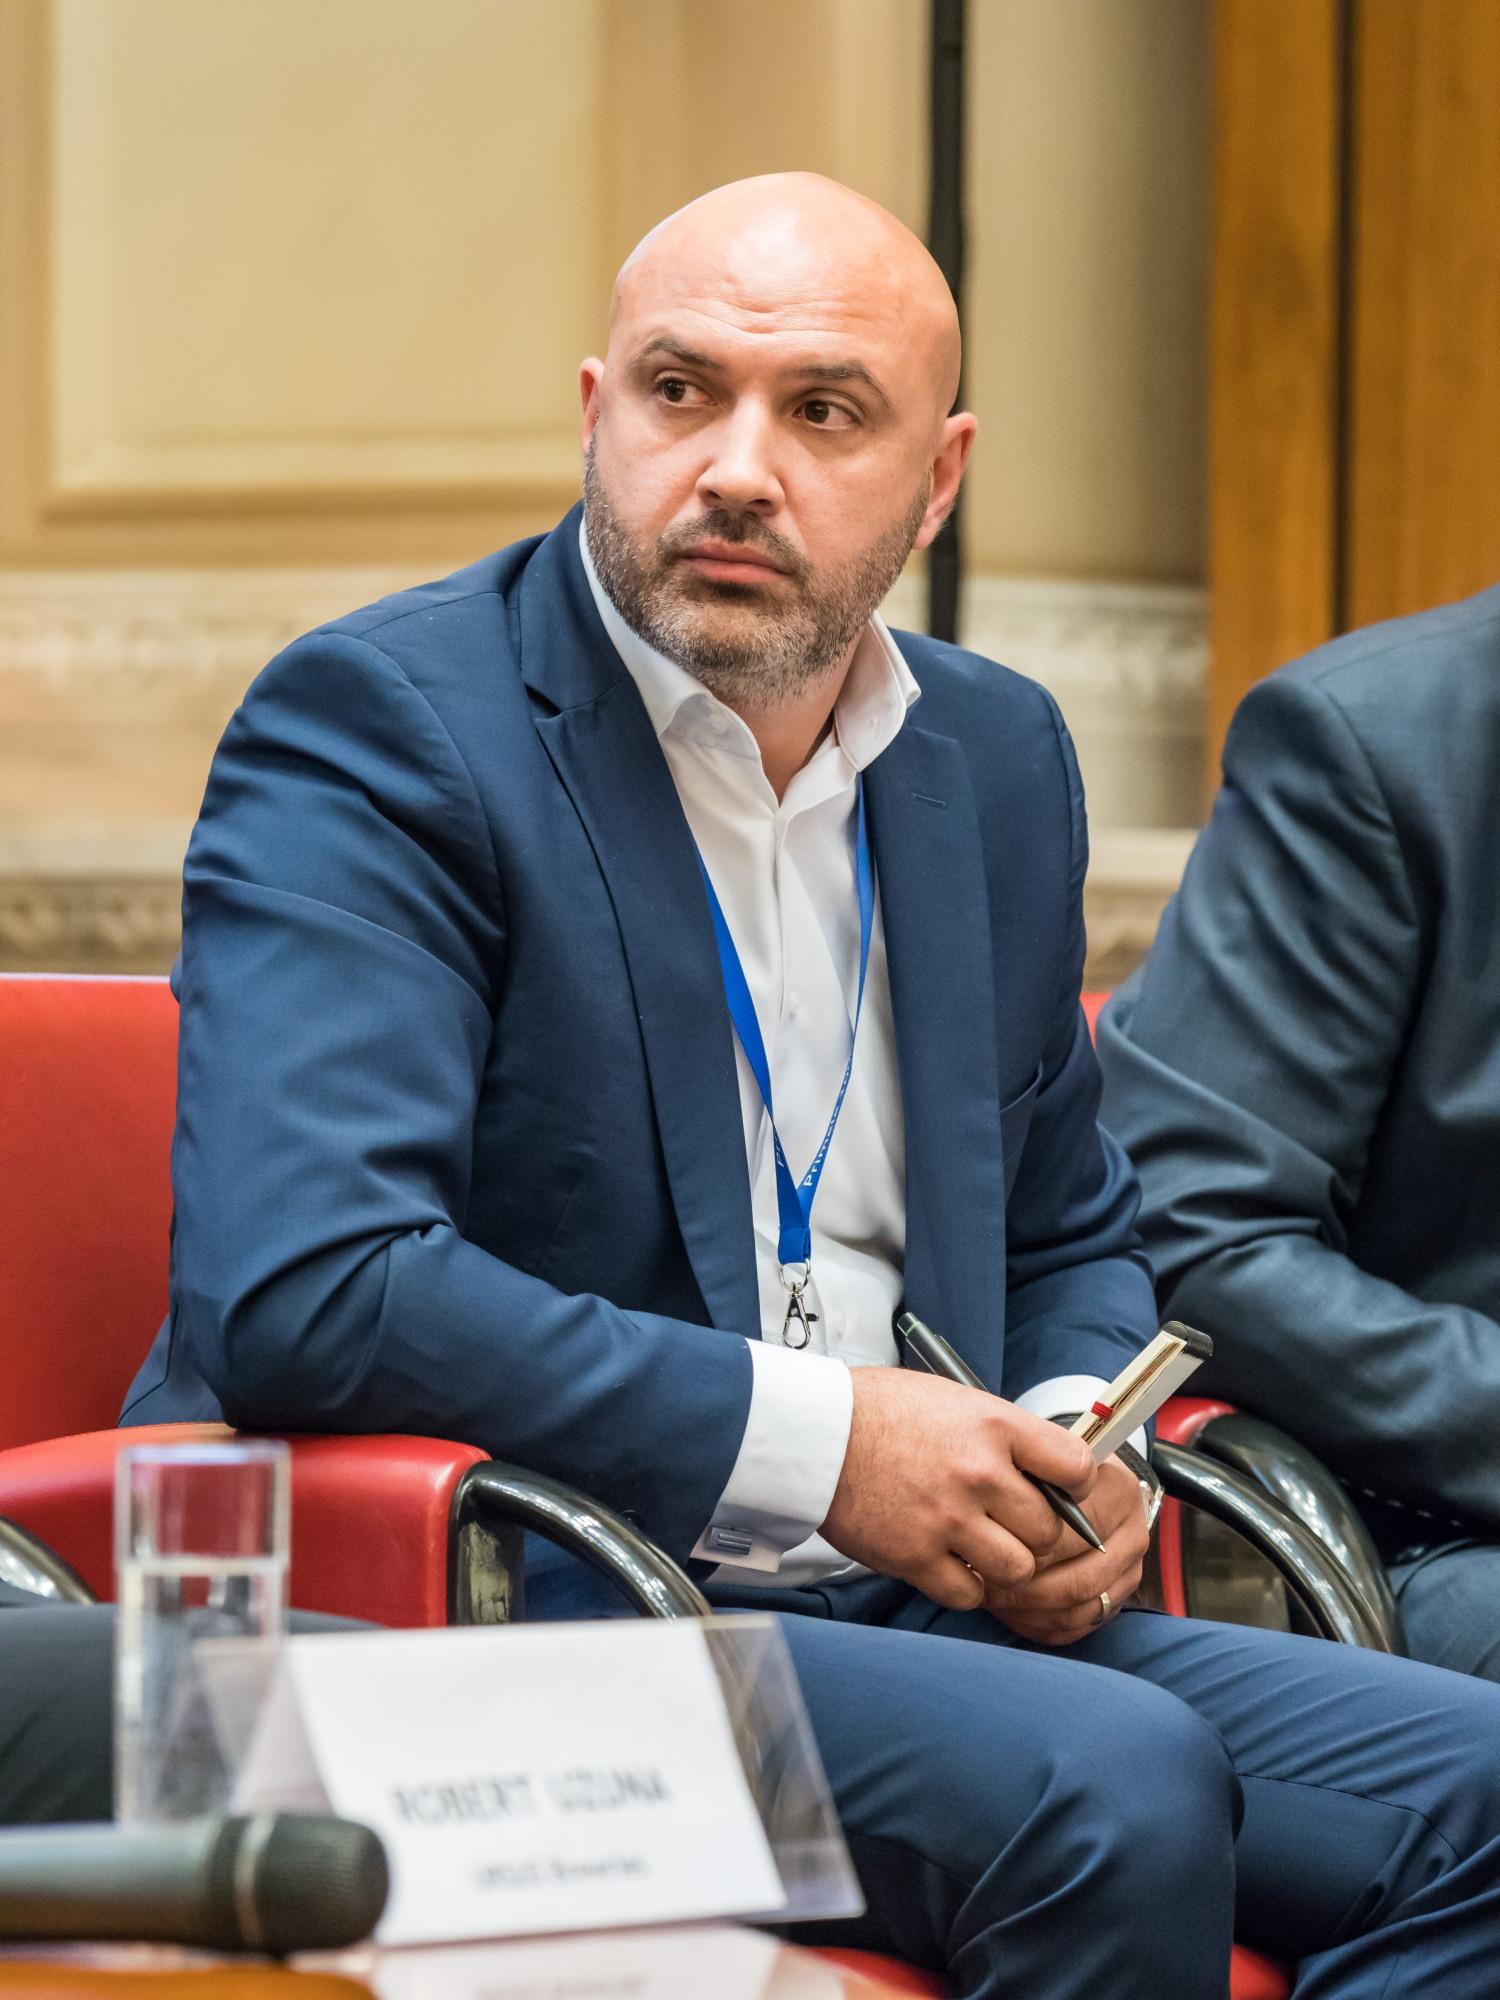 Valer Hancaș, Corporate Affairs & Communication Manager, Kaufland România